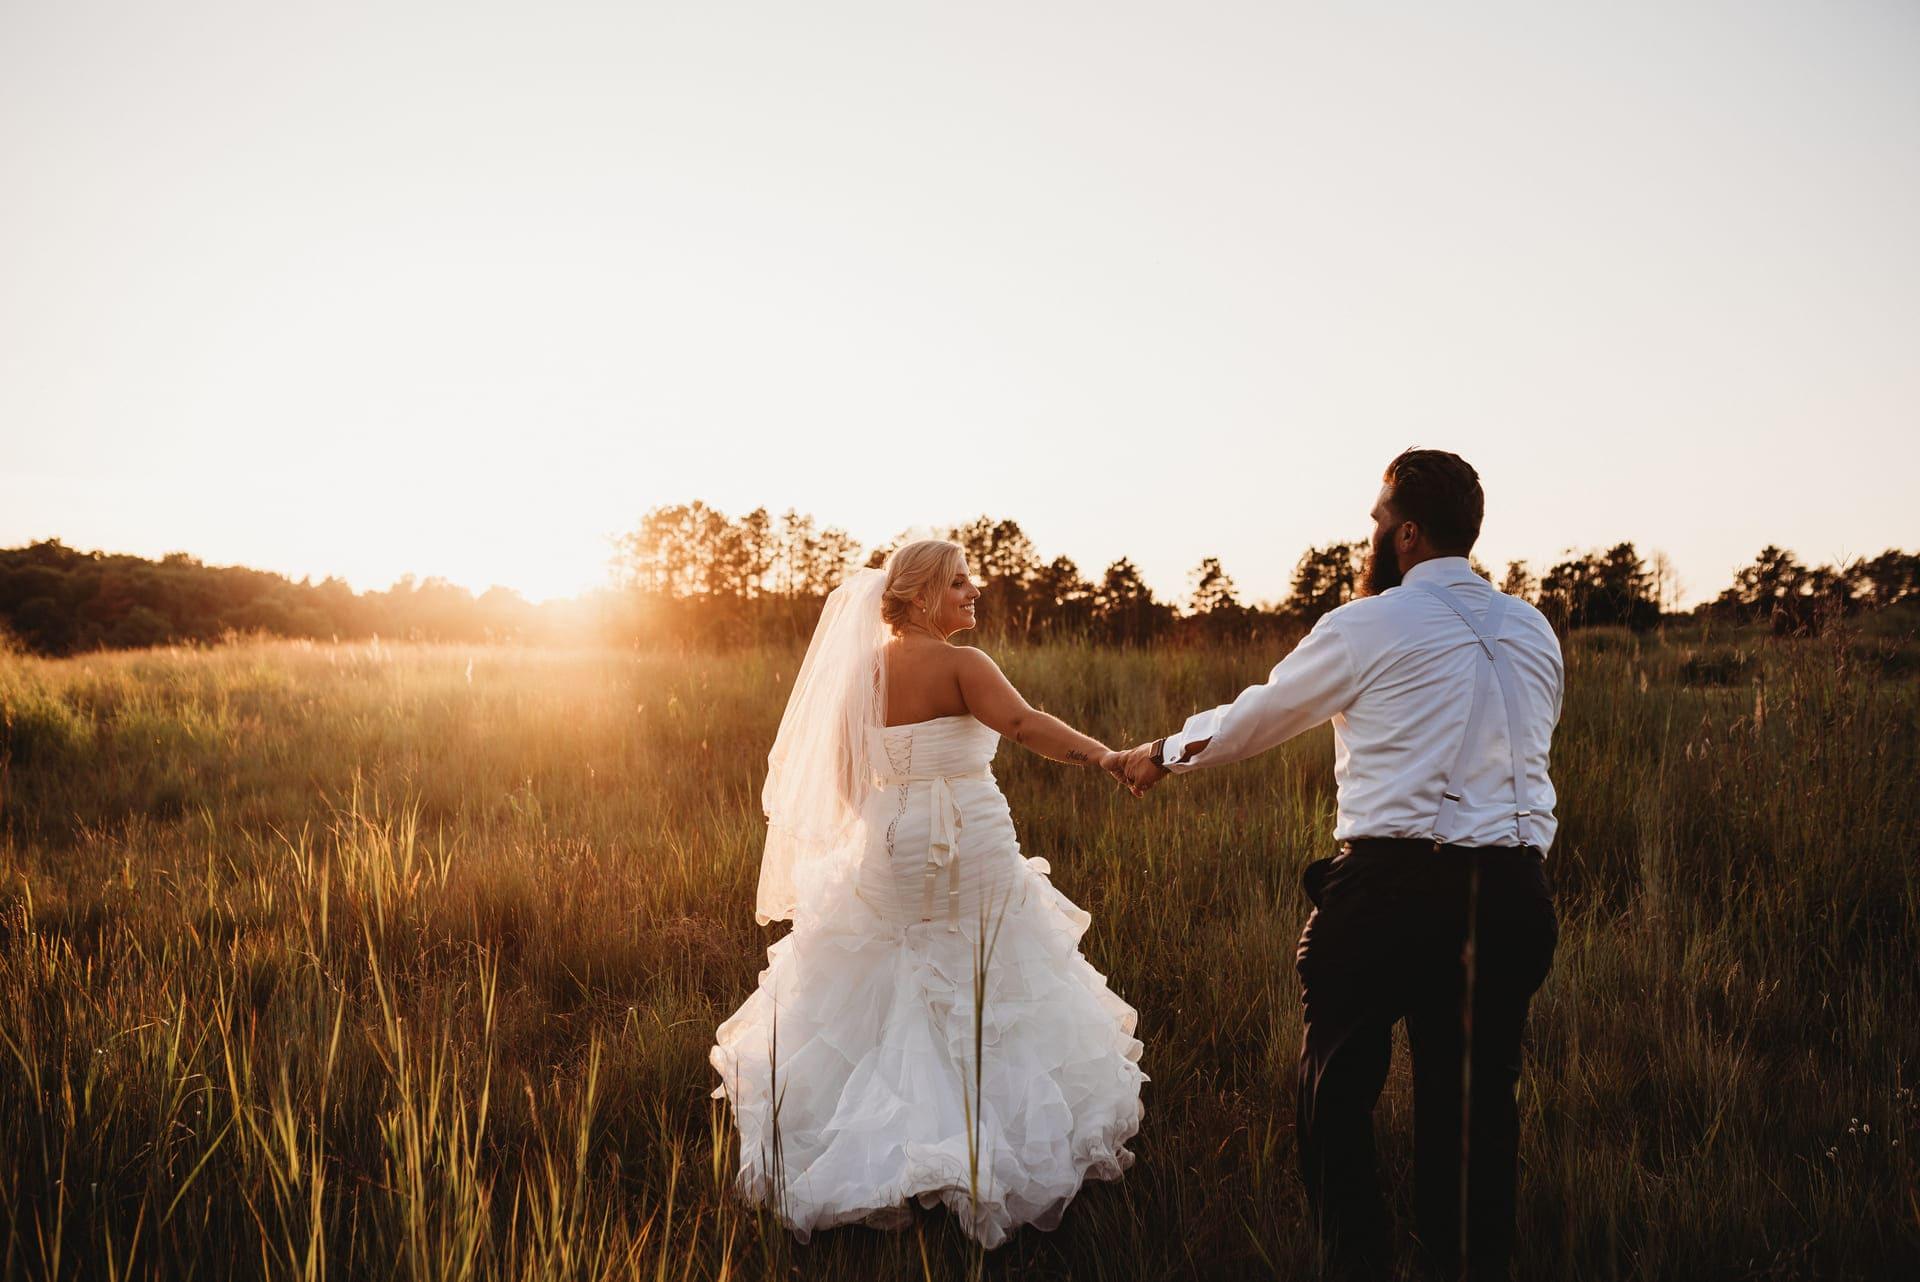 Sunset Brides Richland Michigan Wedding Photography